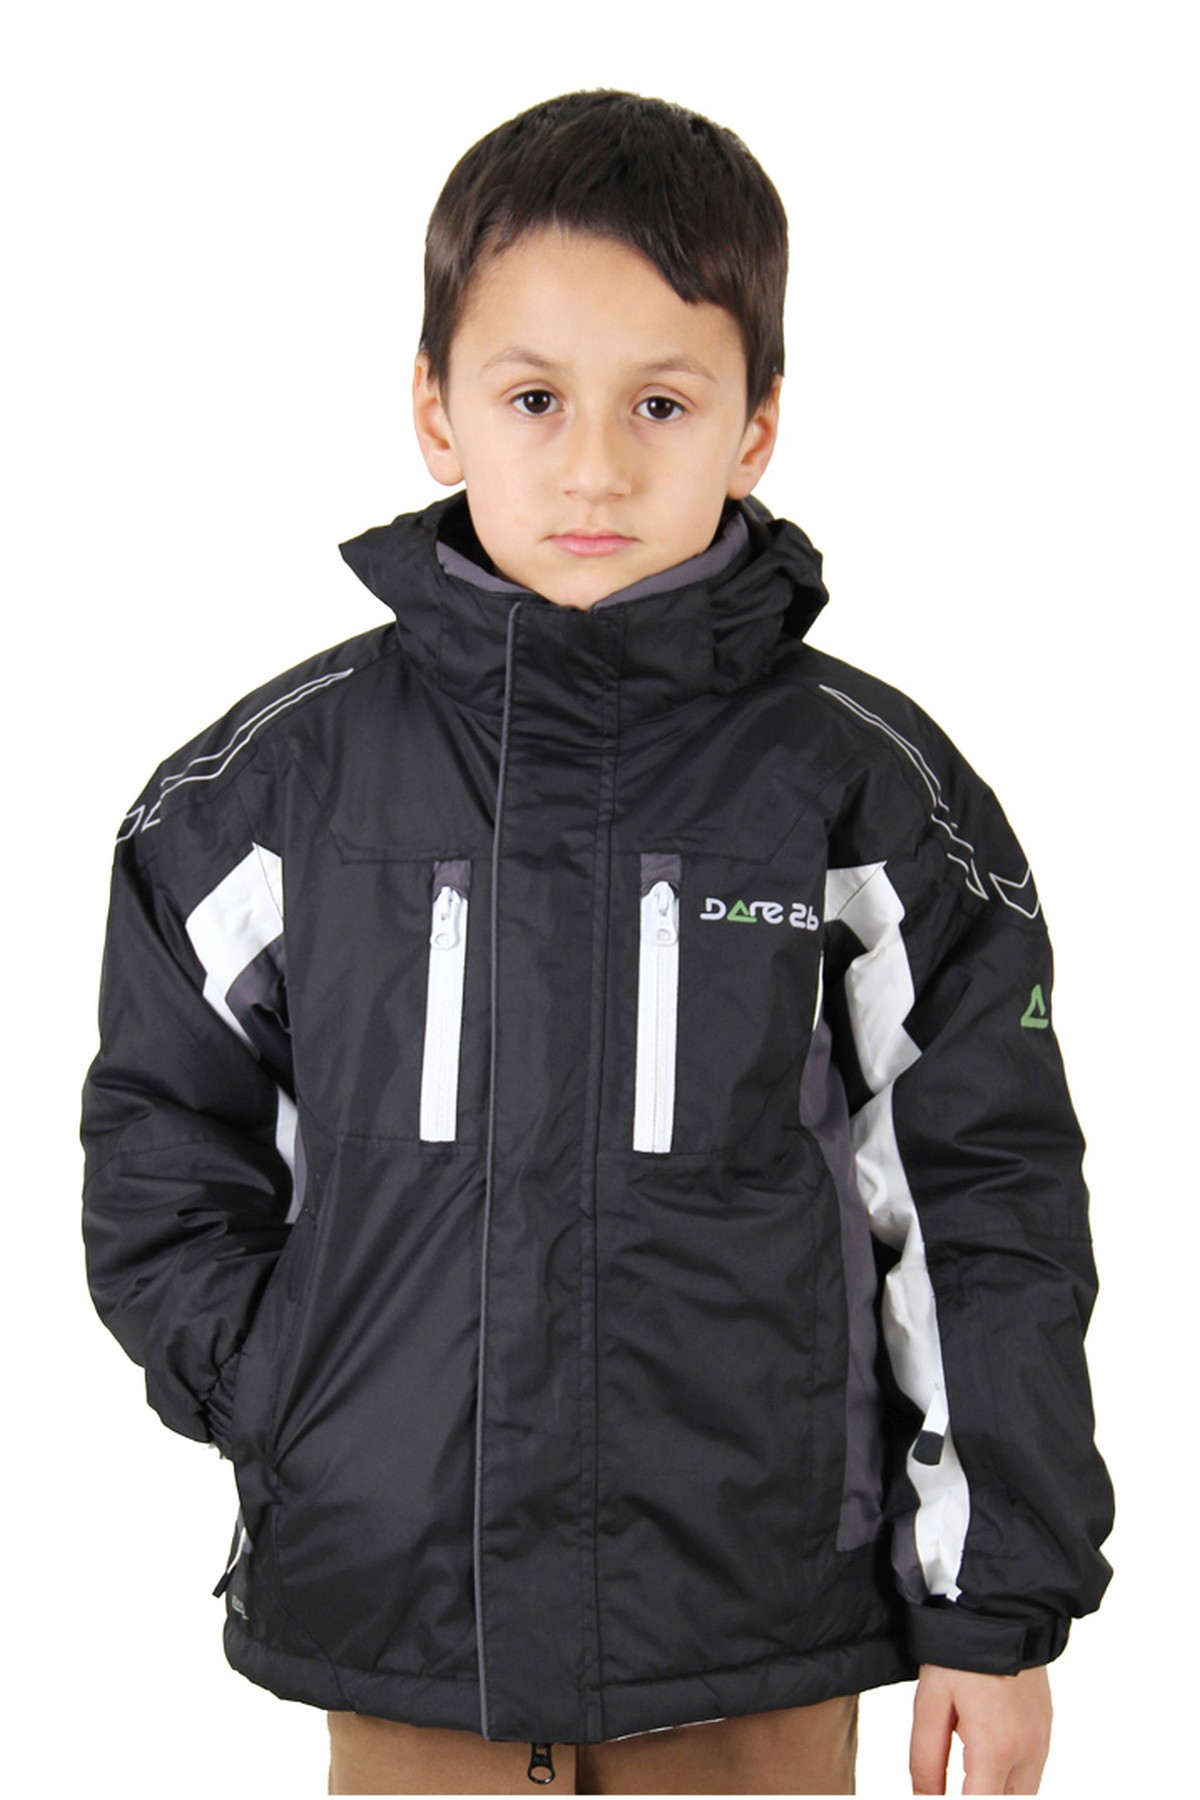 Dare2b Çocuk Kayak Montu  PDKP051-0GU